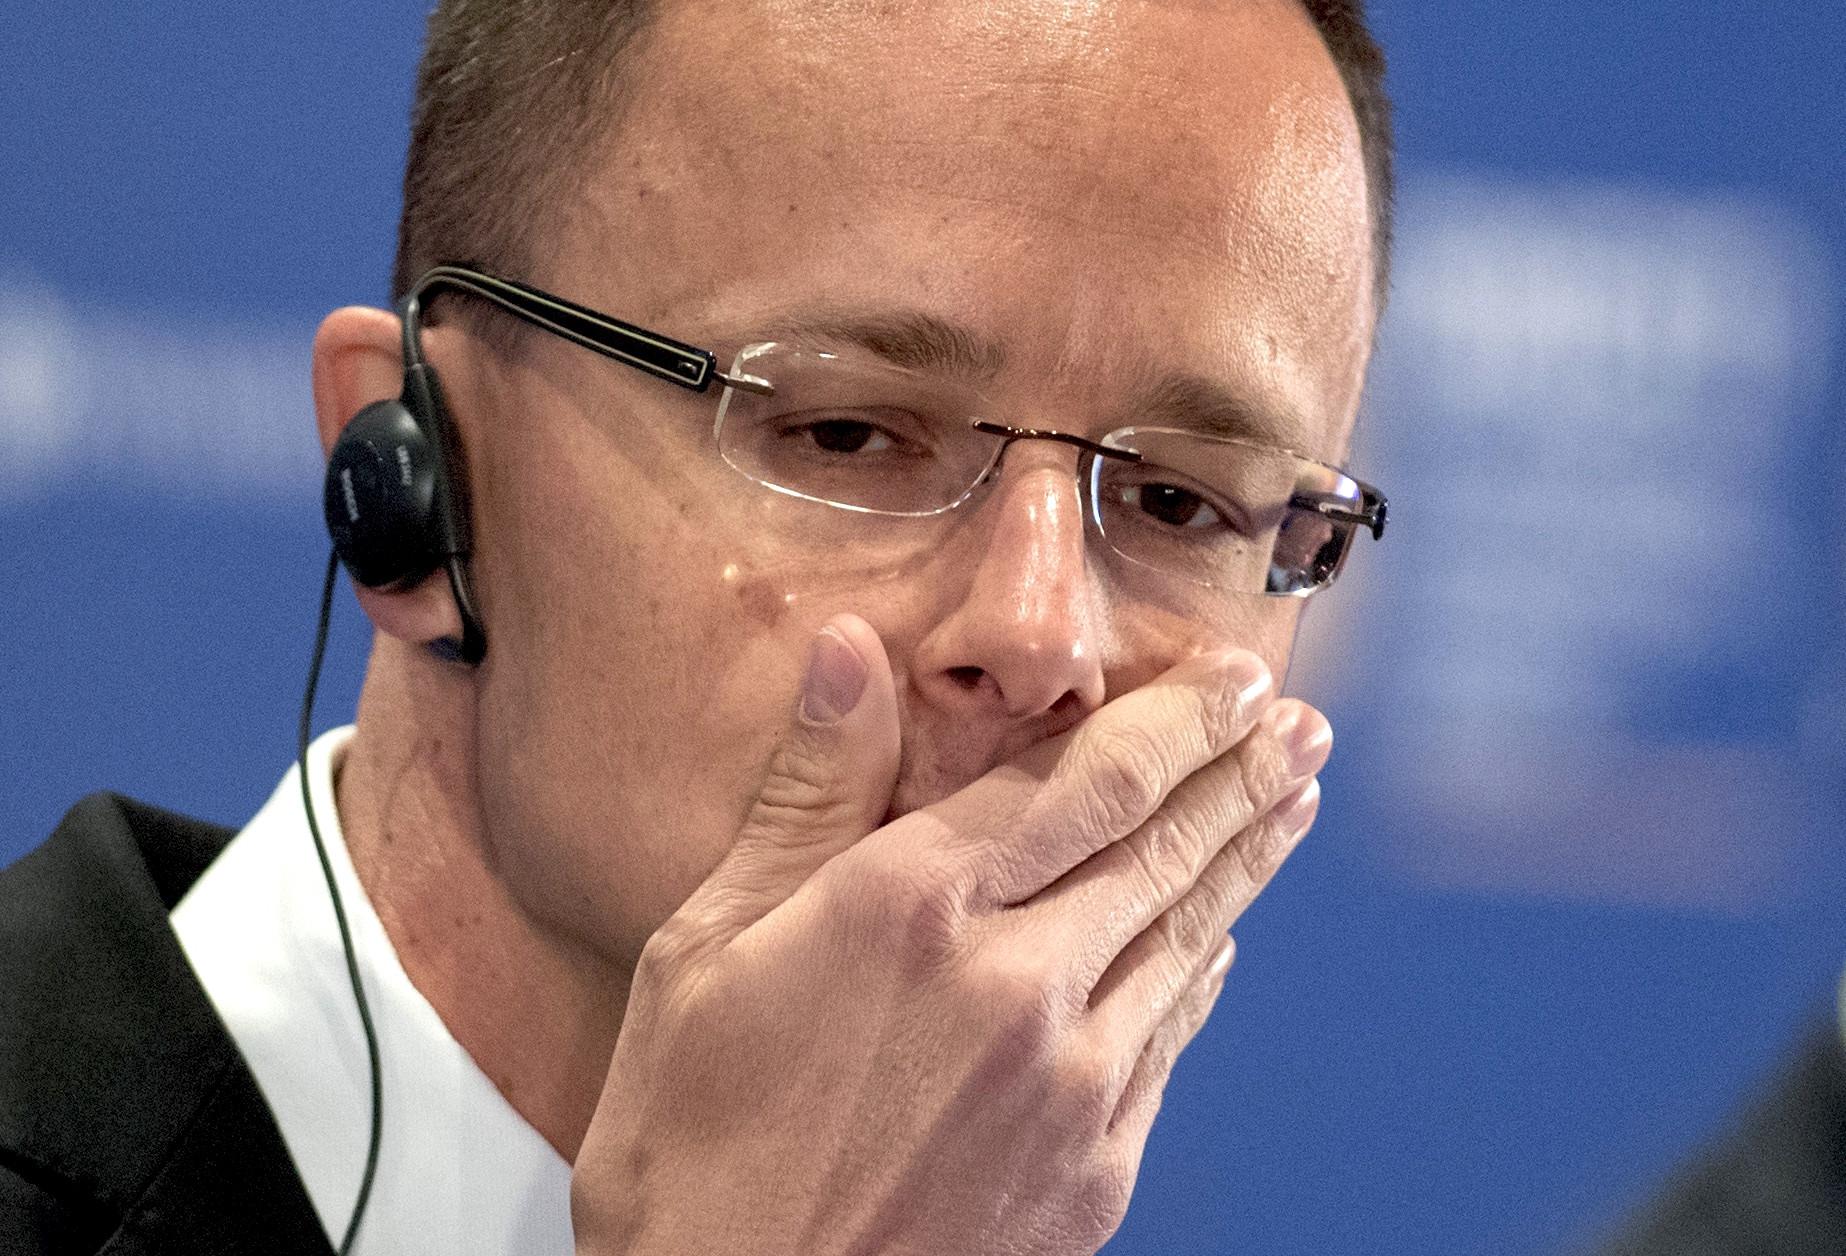 <p>Министр иностранных дел Венгрии&nbsp;<span>Петер Сийярто. Фото: &copy; РИА Новости</span></p>